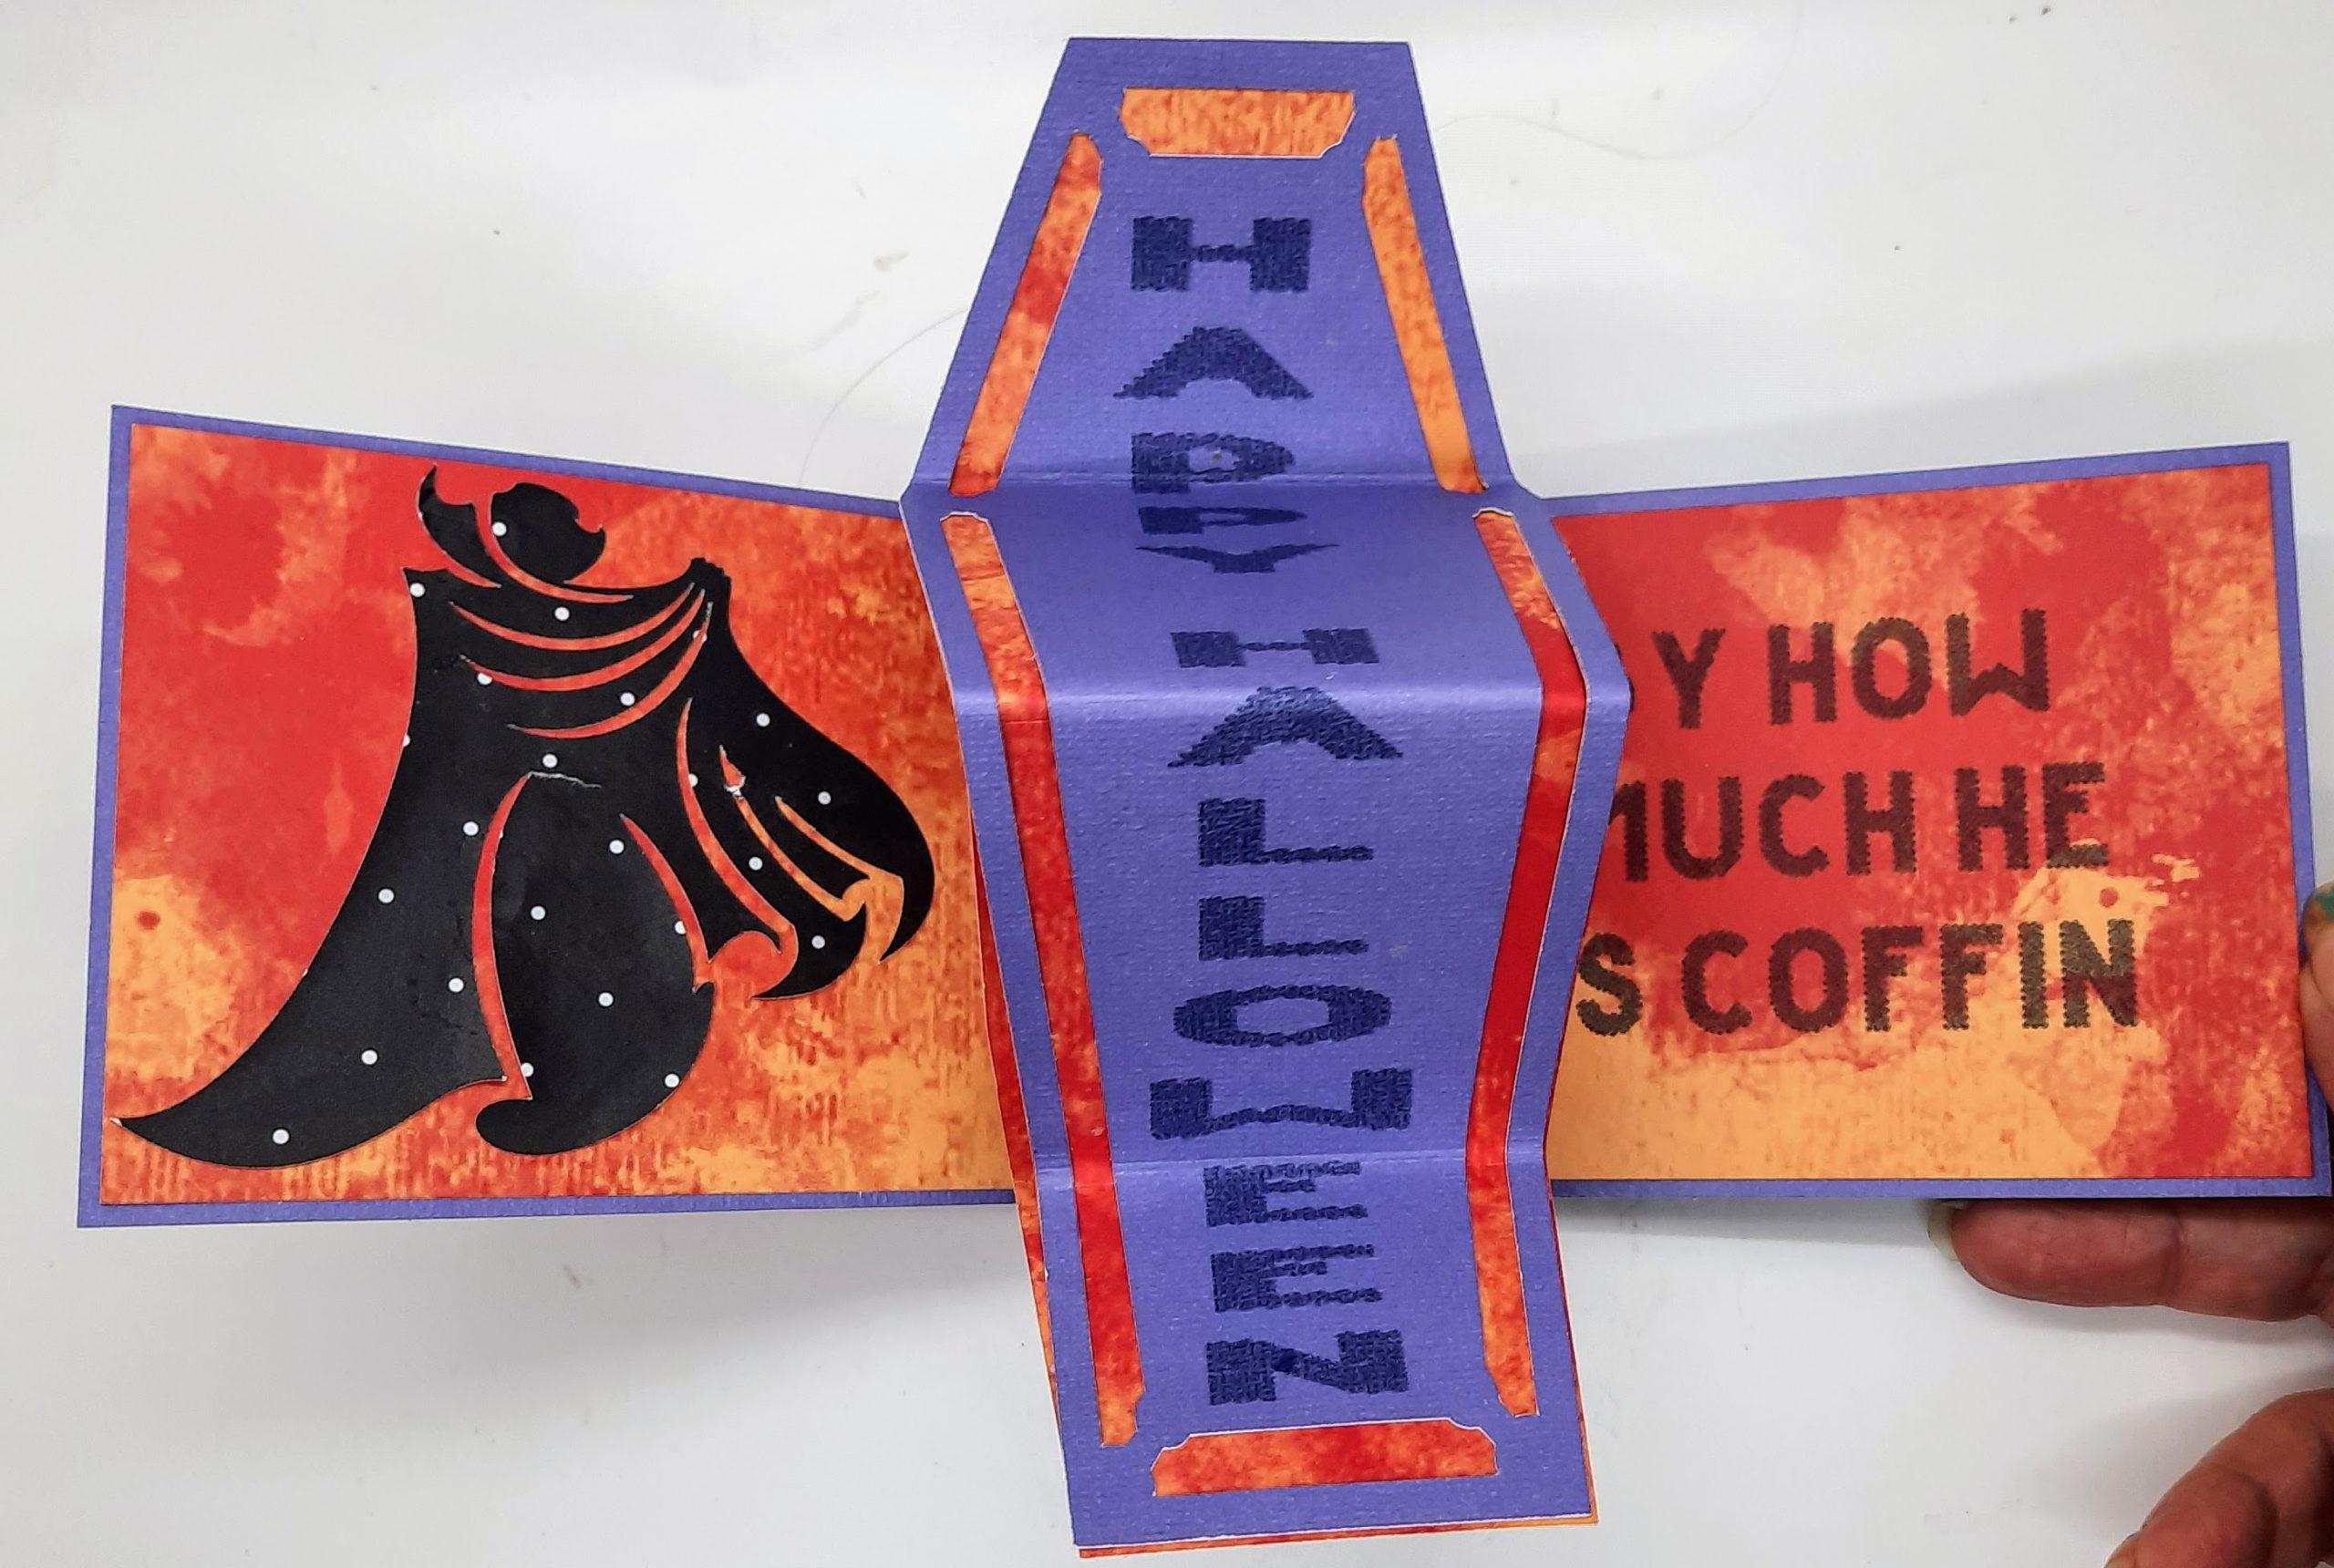 Fun Coffin Twist and Flip Halloween Card